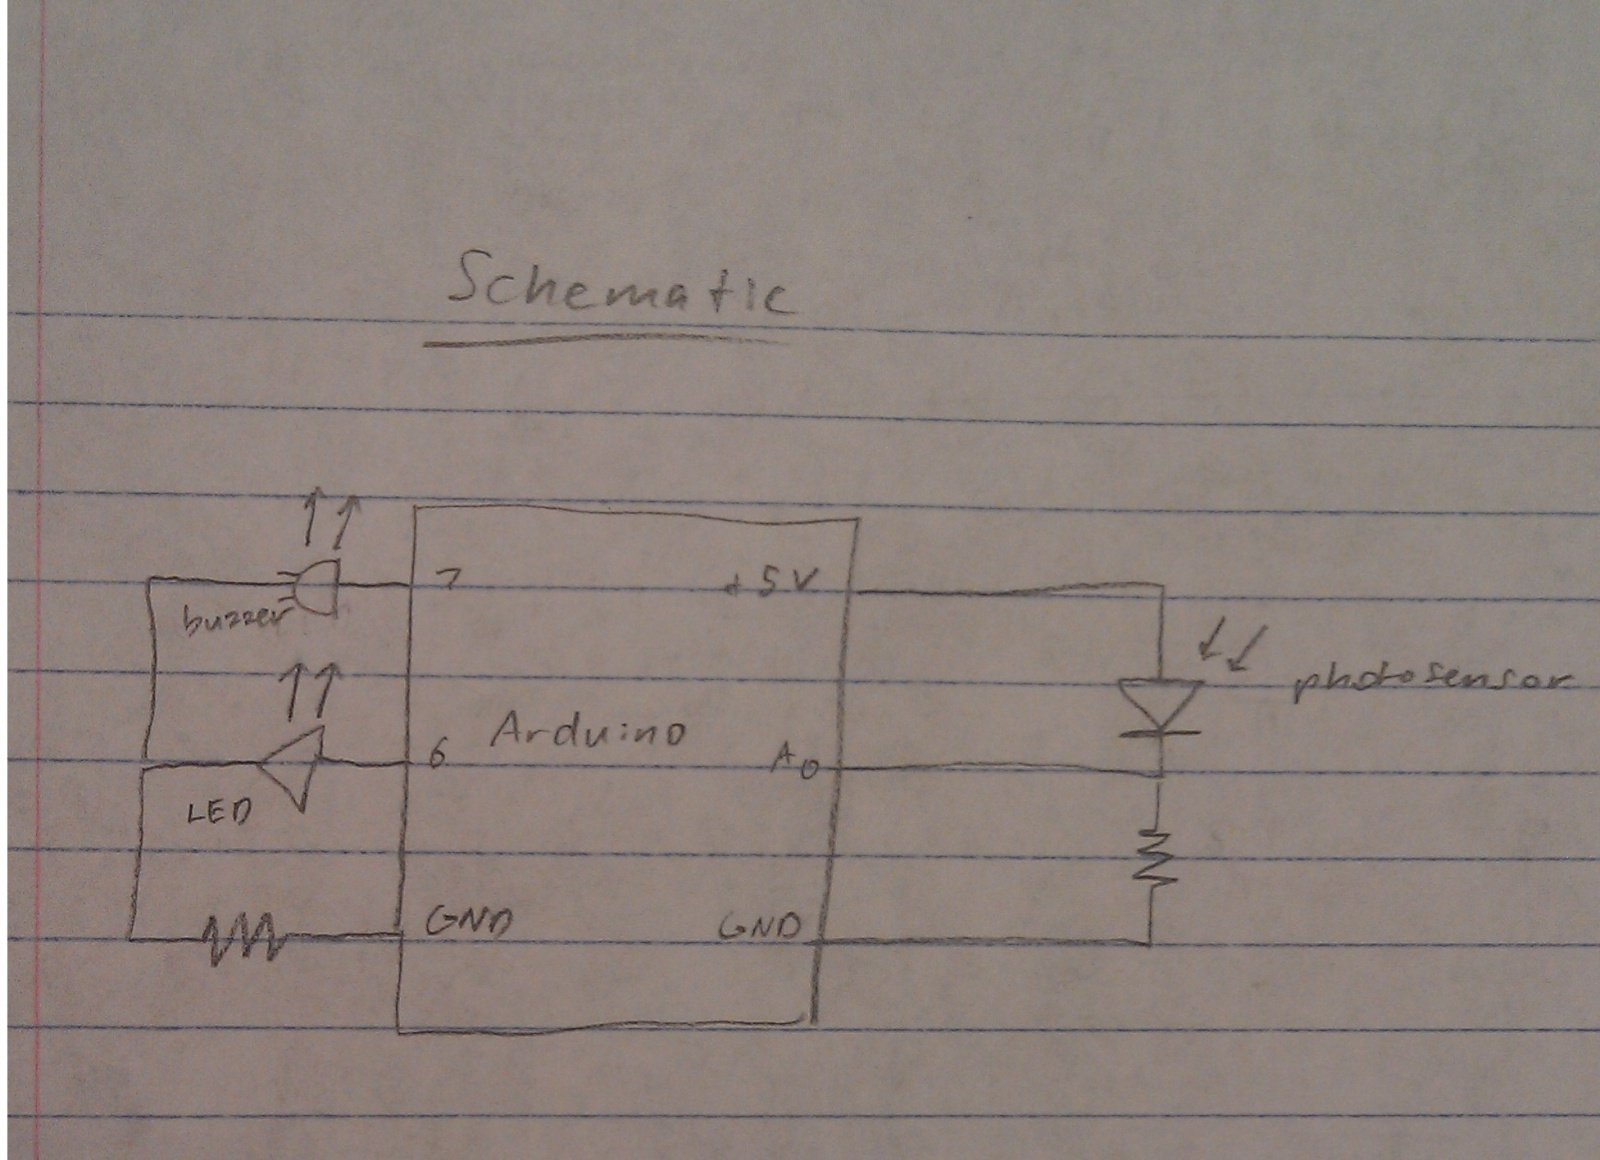 Alarm Circuit Page 6 Security Circuits Transmitter 13 Rf Nextgr Night Light Wake Up Combo